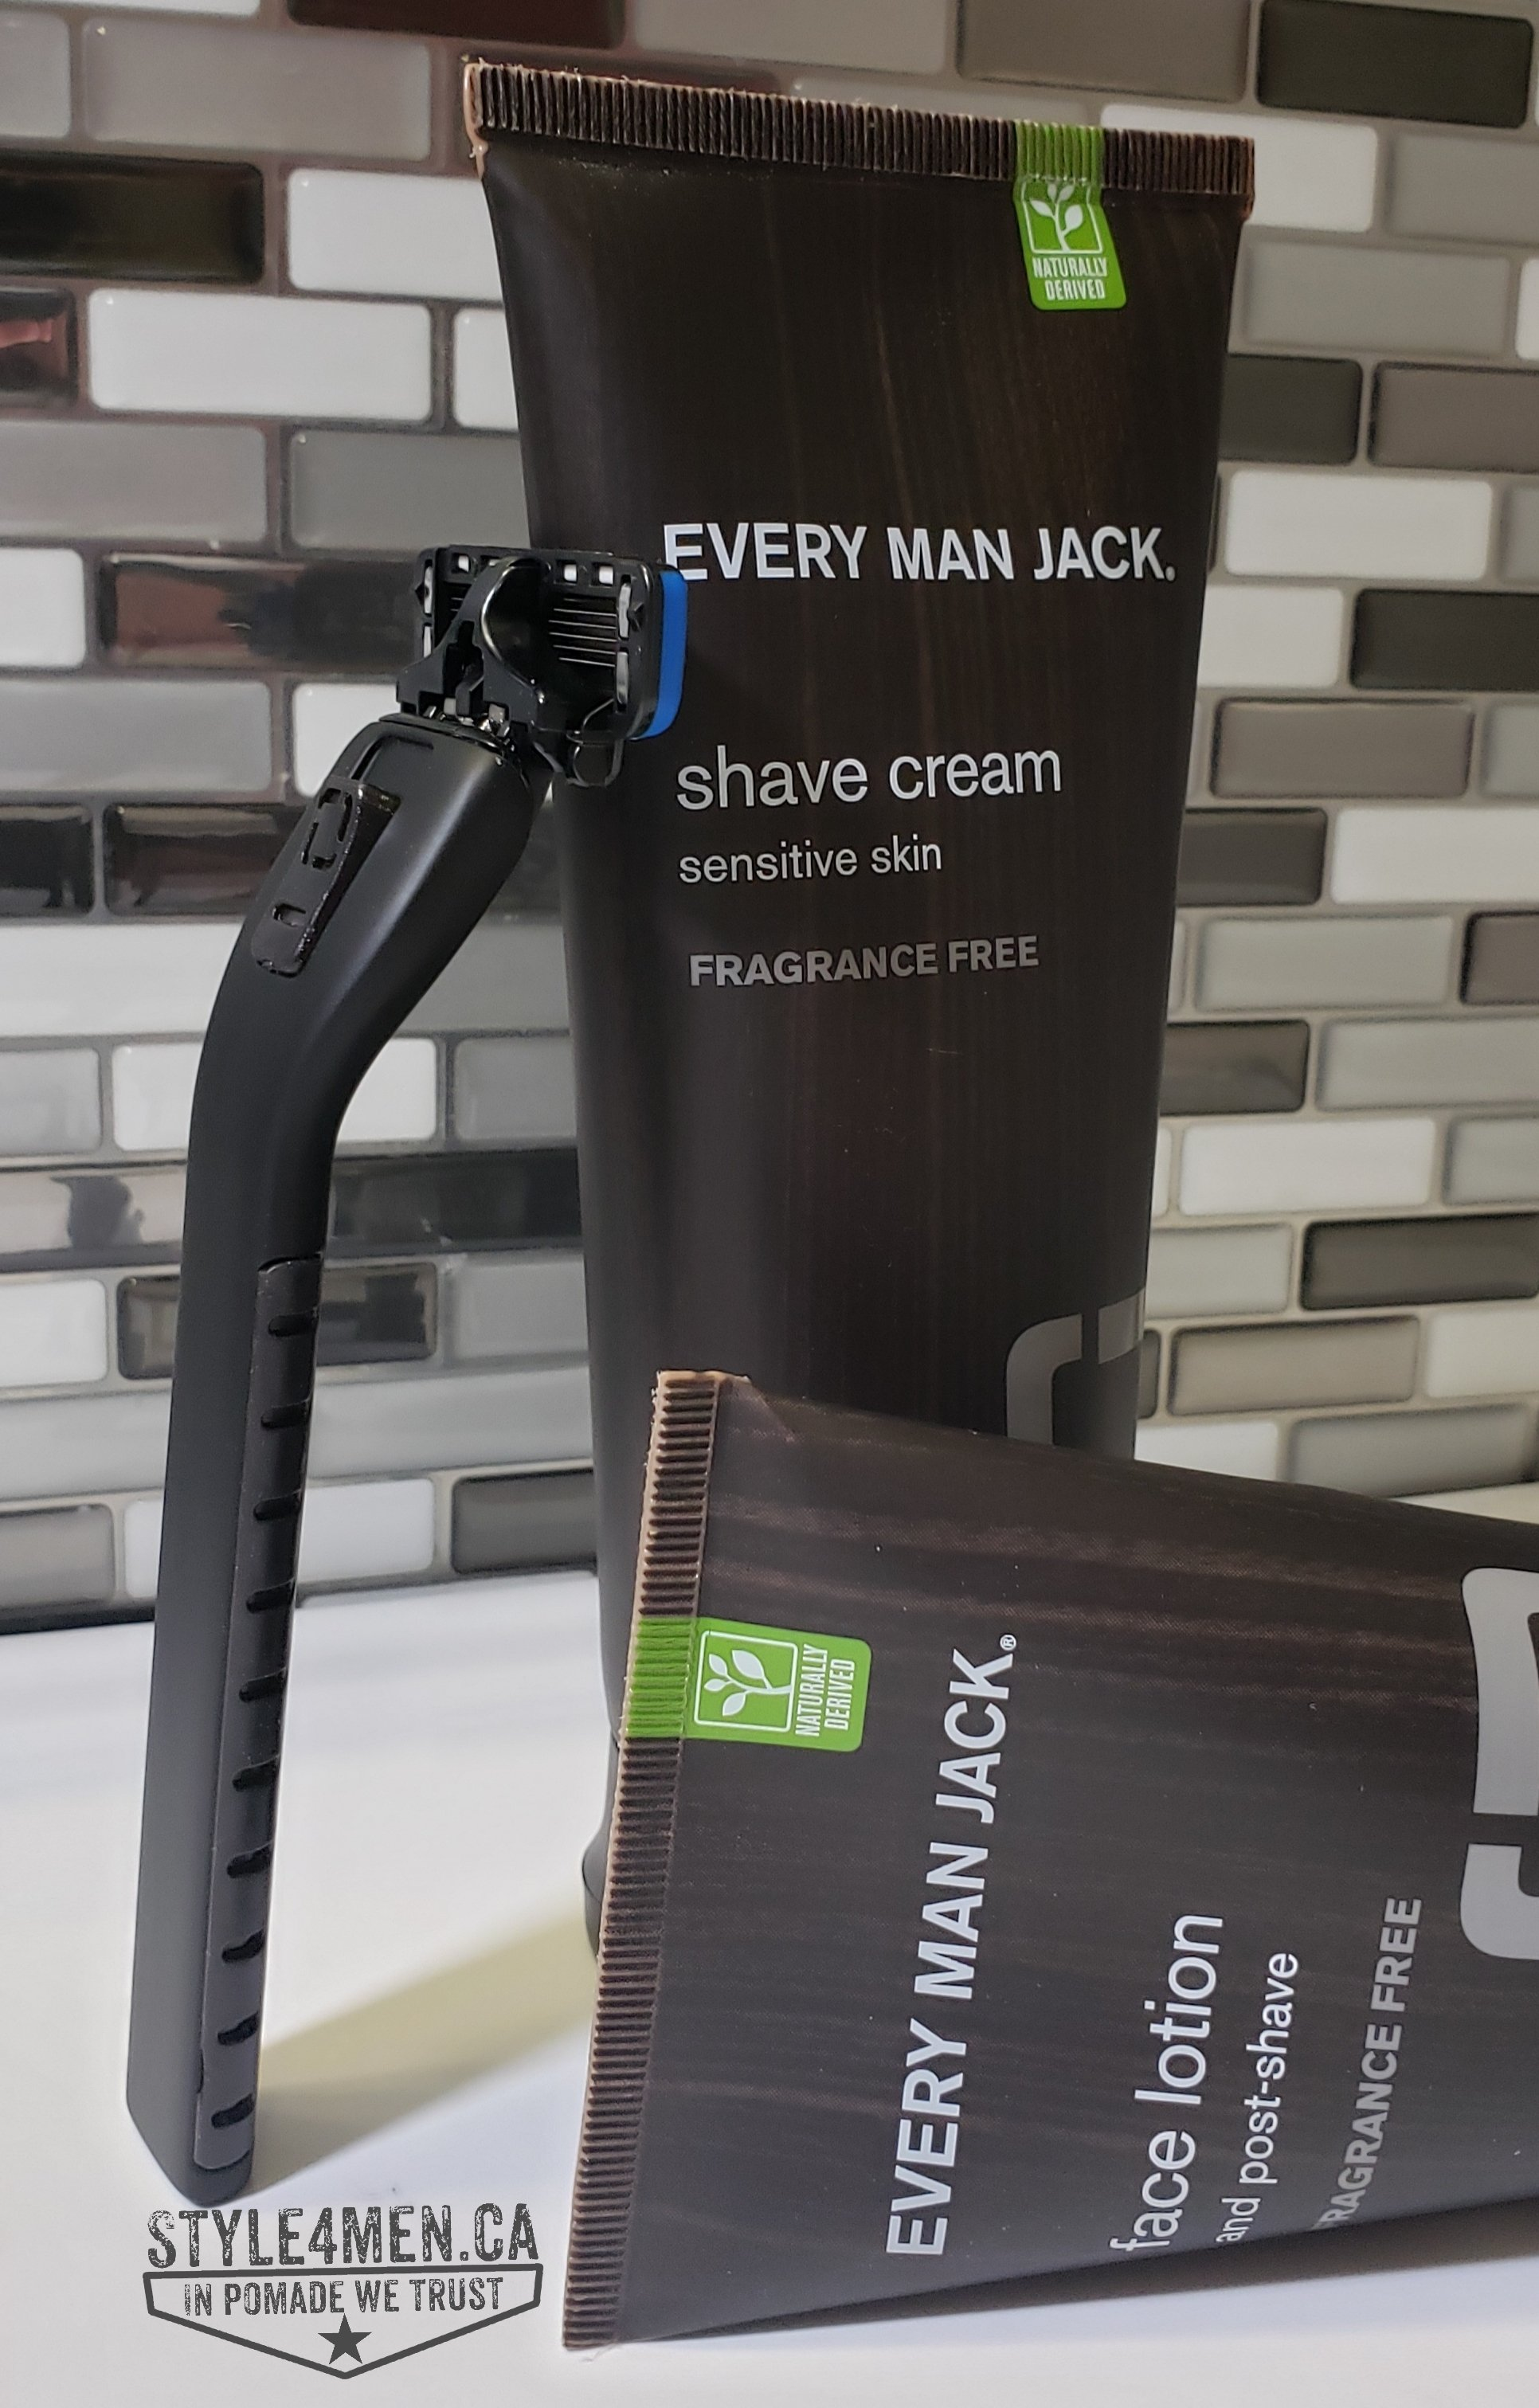 Every Man Jack Razor